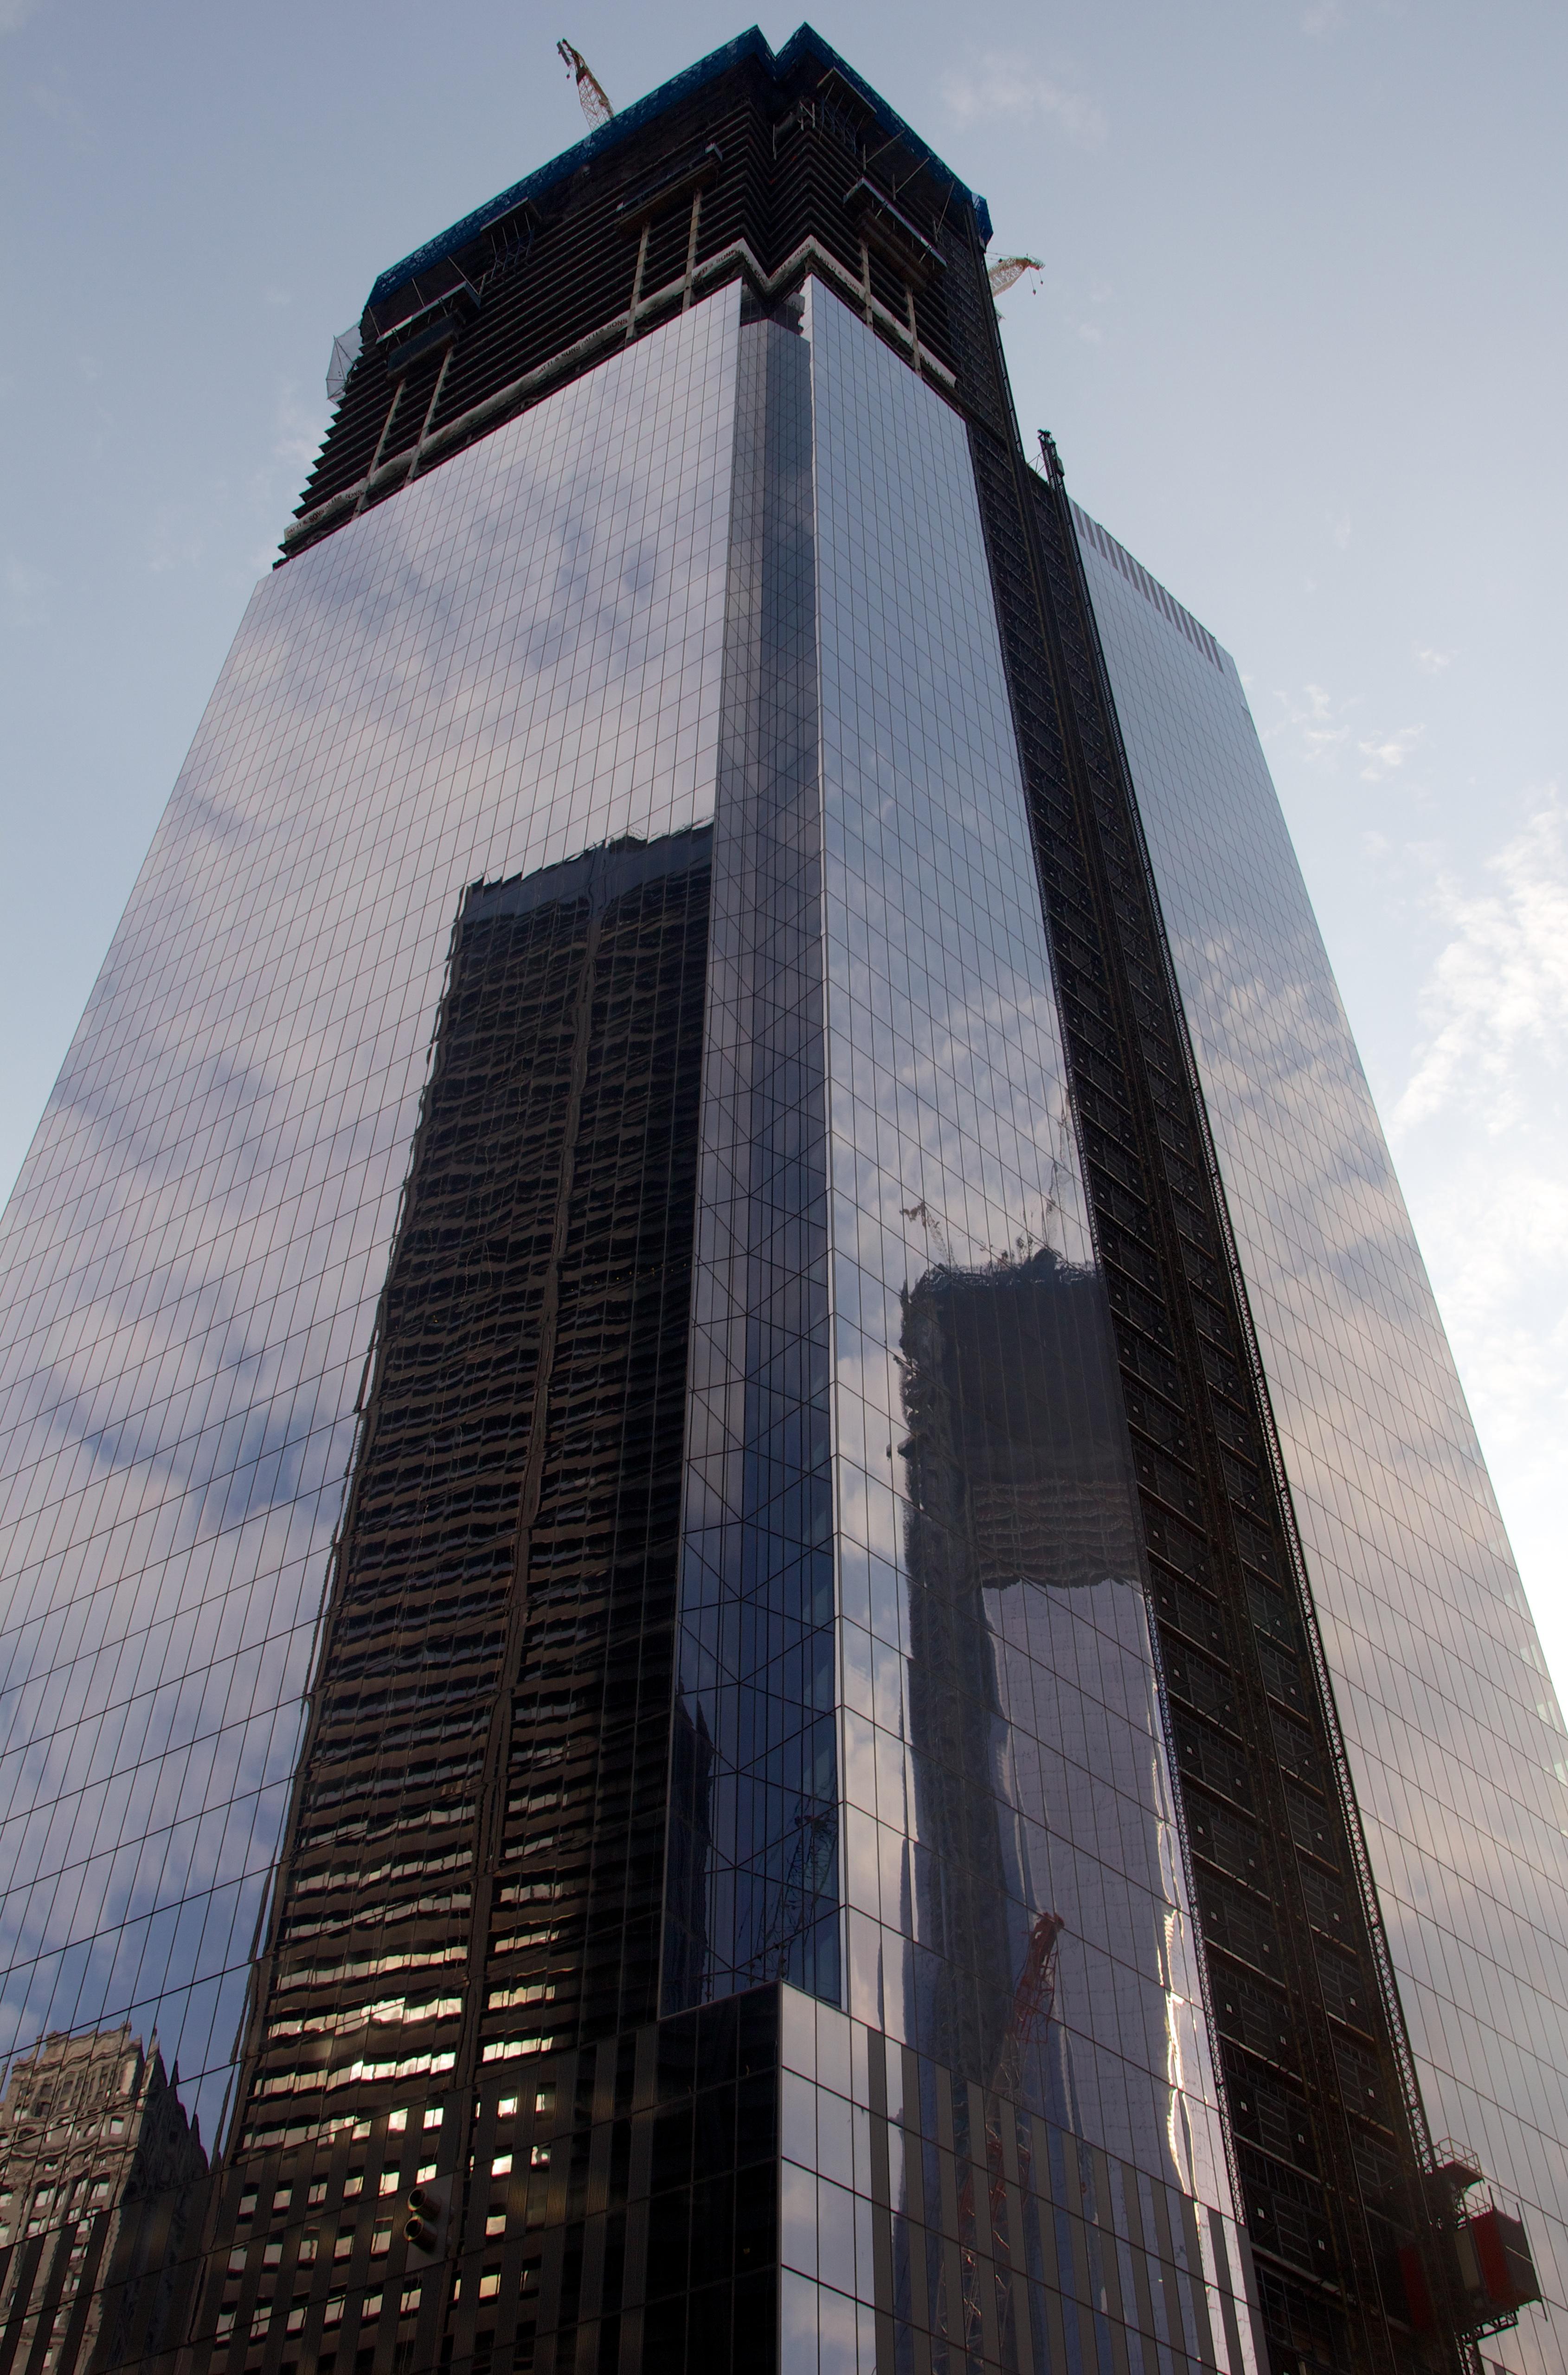 World Trade Center Construction : File one world trade center under construction